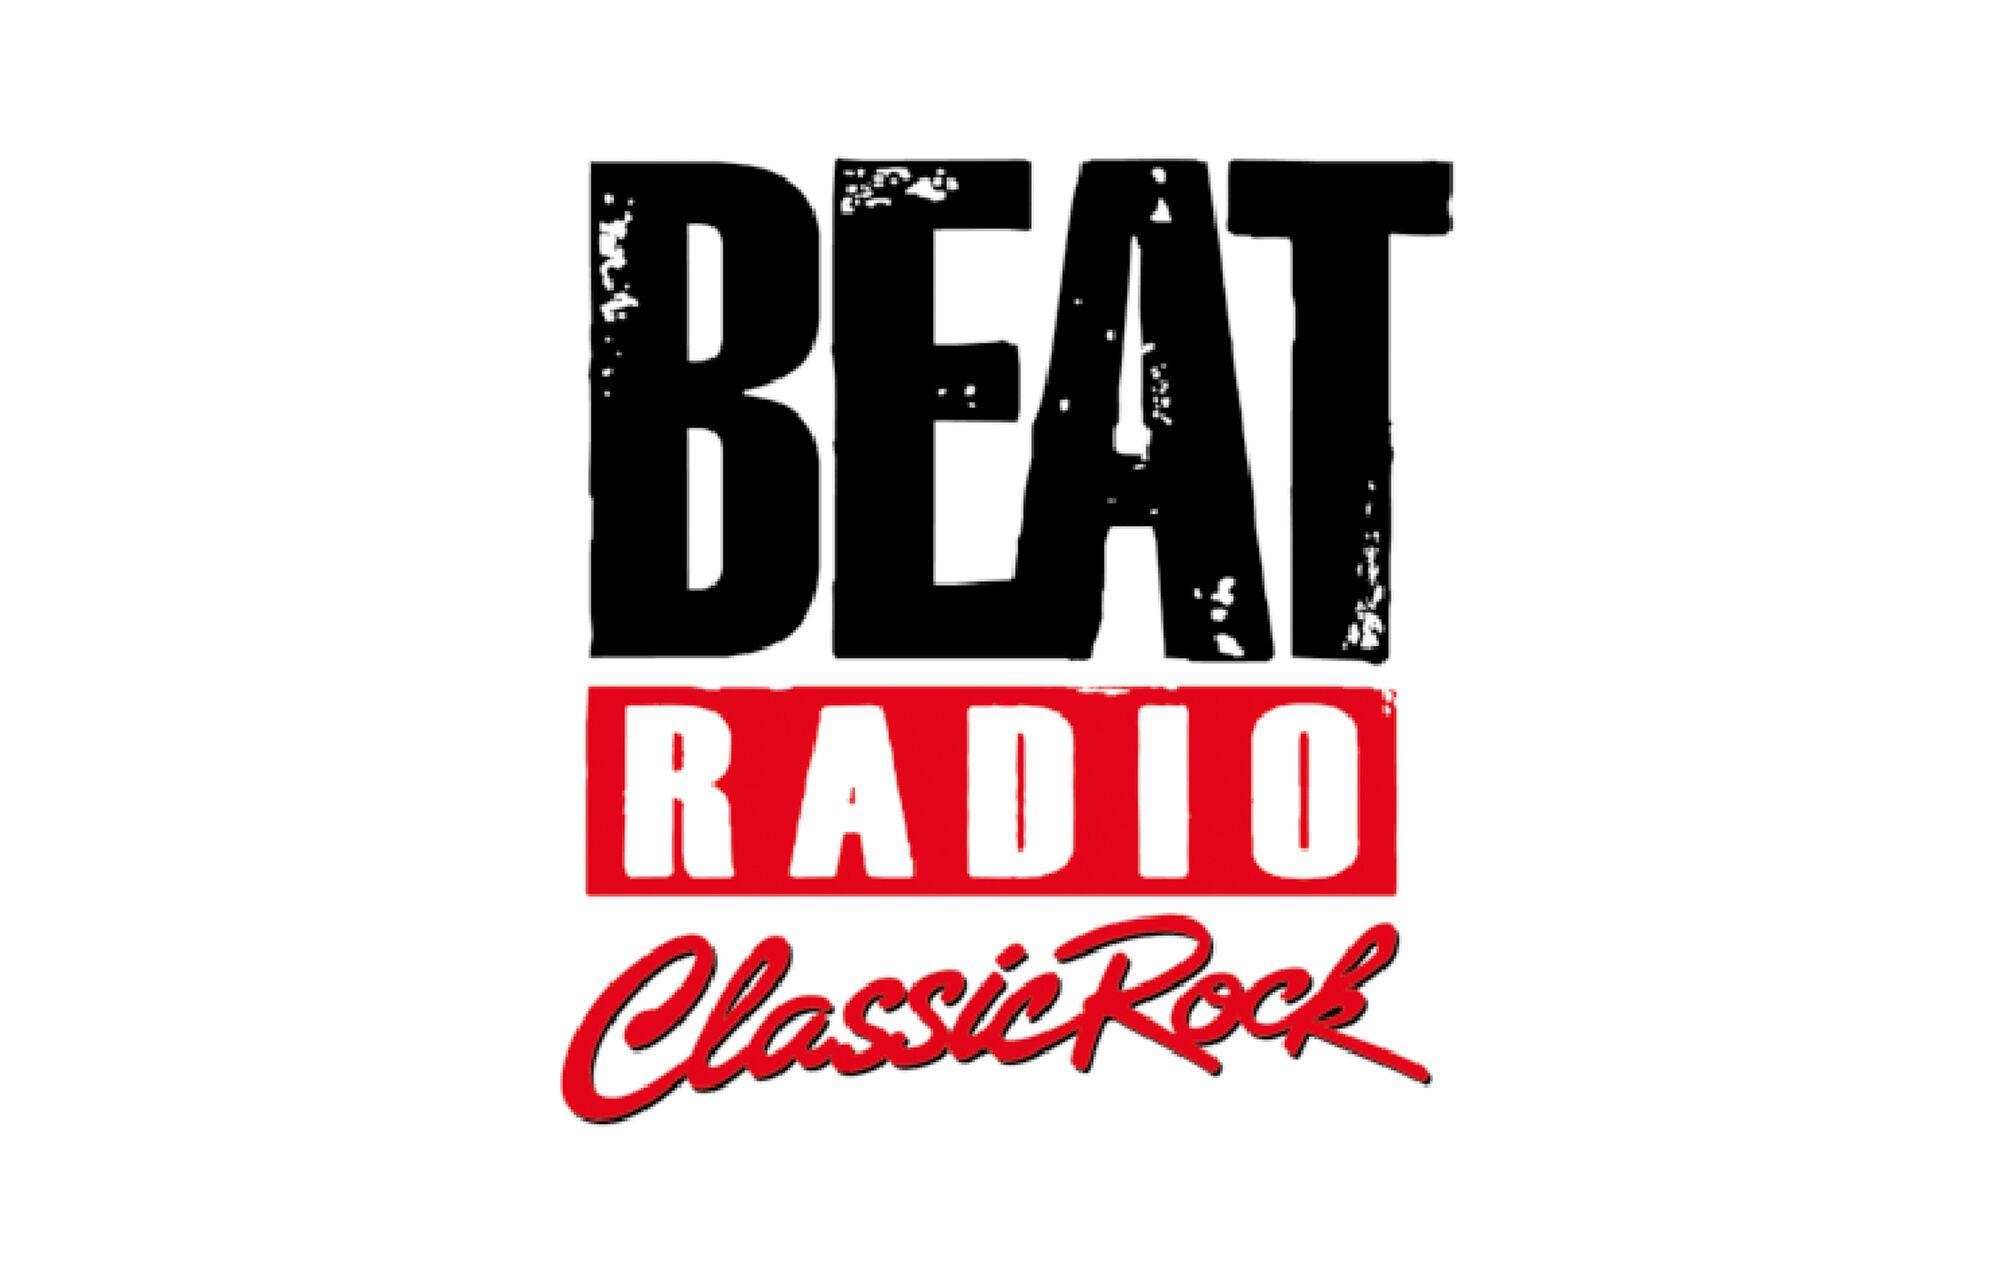 Beat Radio Classic Rock